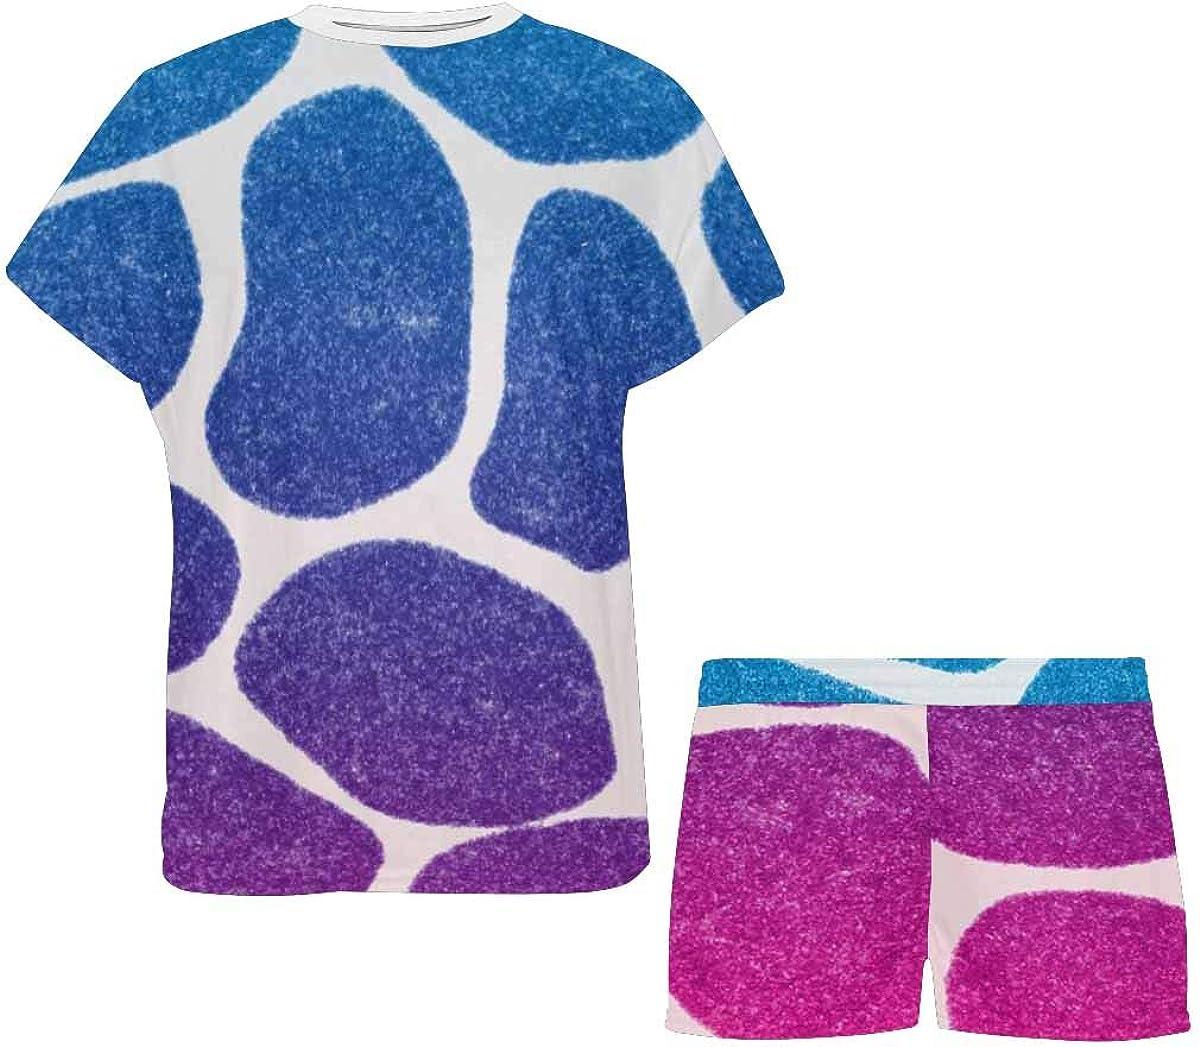 INTERESTPRINT Colorful Pattern of Animal Skin Women Sleepwear Short Sleeves Pajama Sets